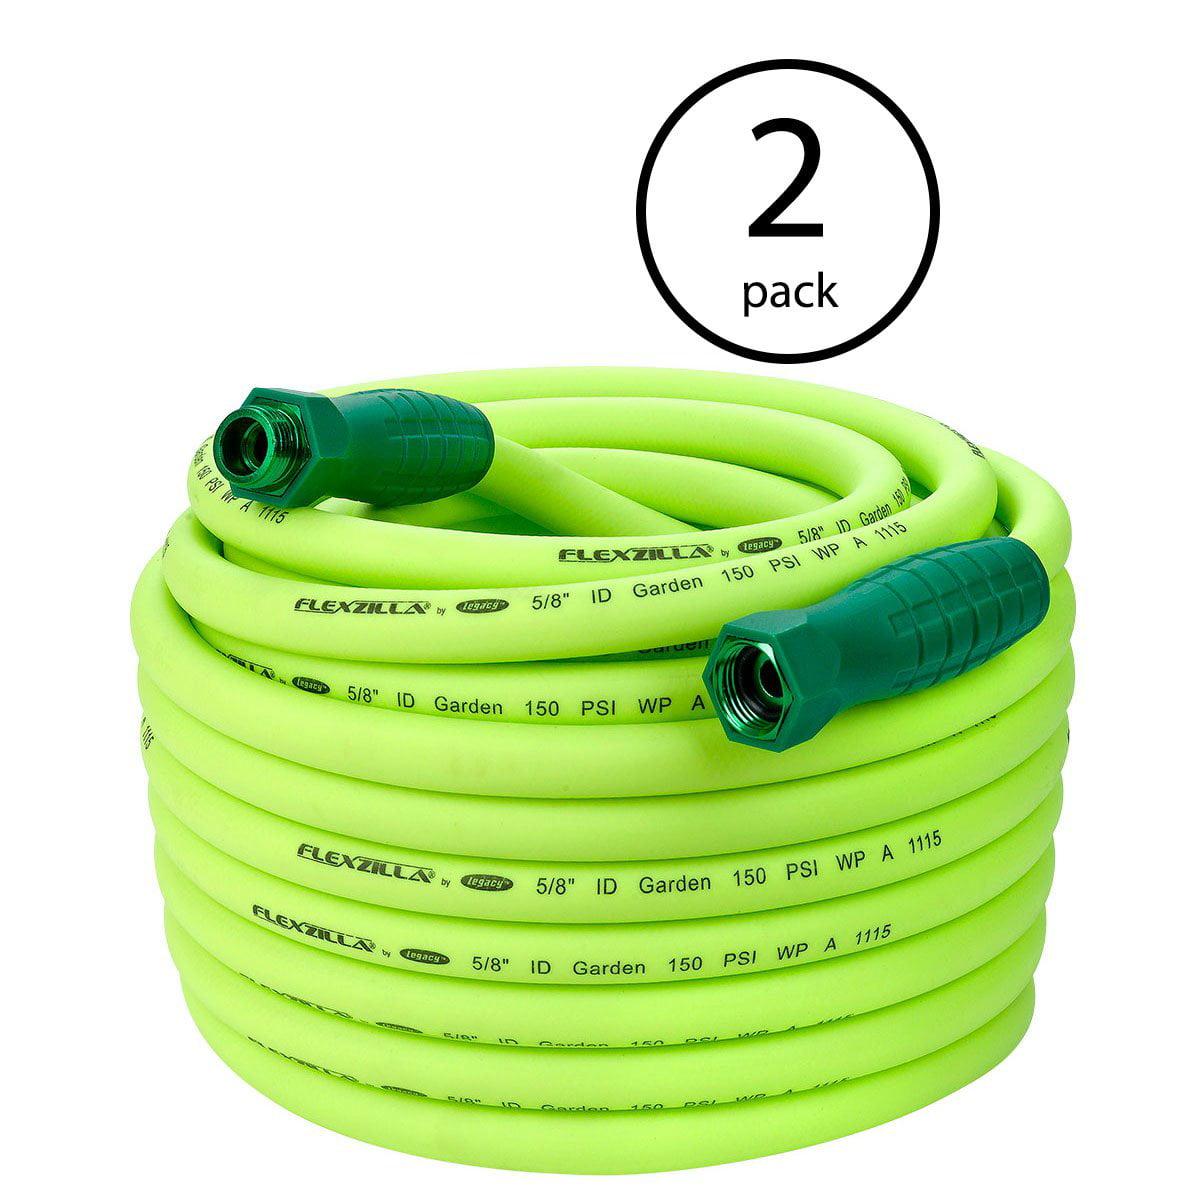 "Flexzilla SwivelGrip Garden Water Hose, 5/8"" x 100', 3/4""-11.5 Fitting (2 Pack)"